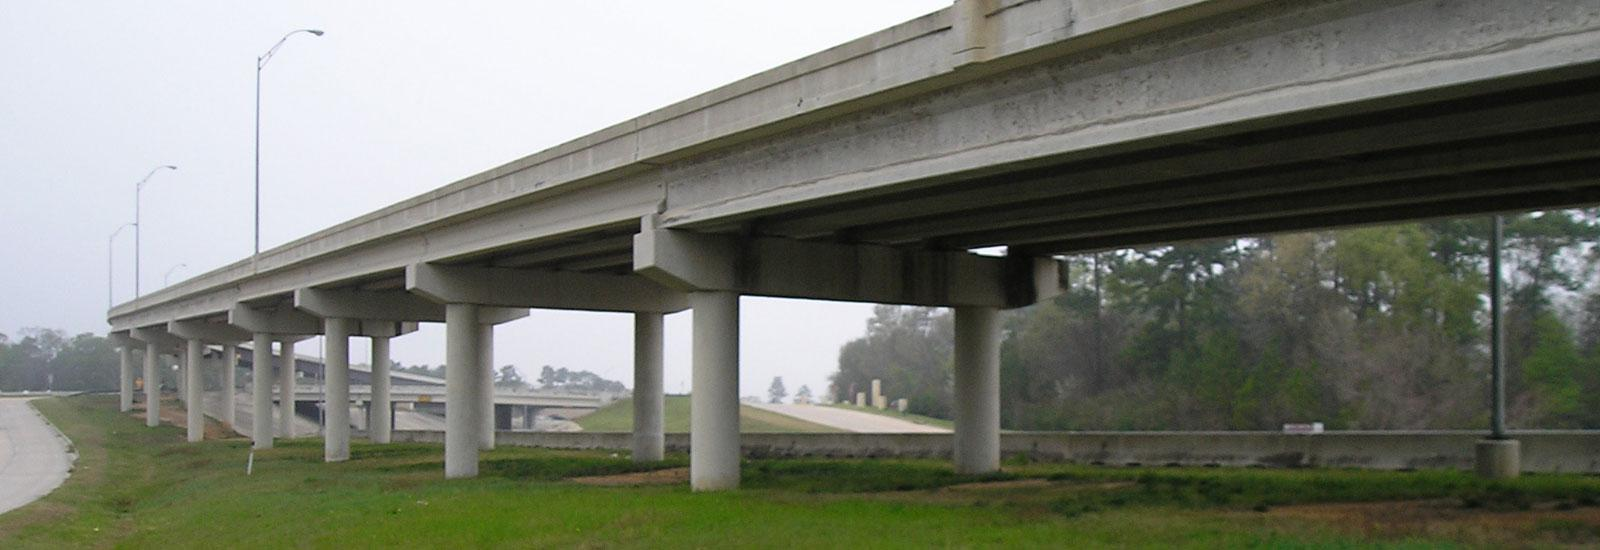 Bridge Assessment and Rehabilitation